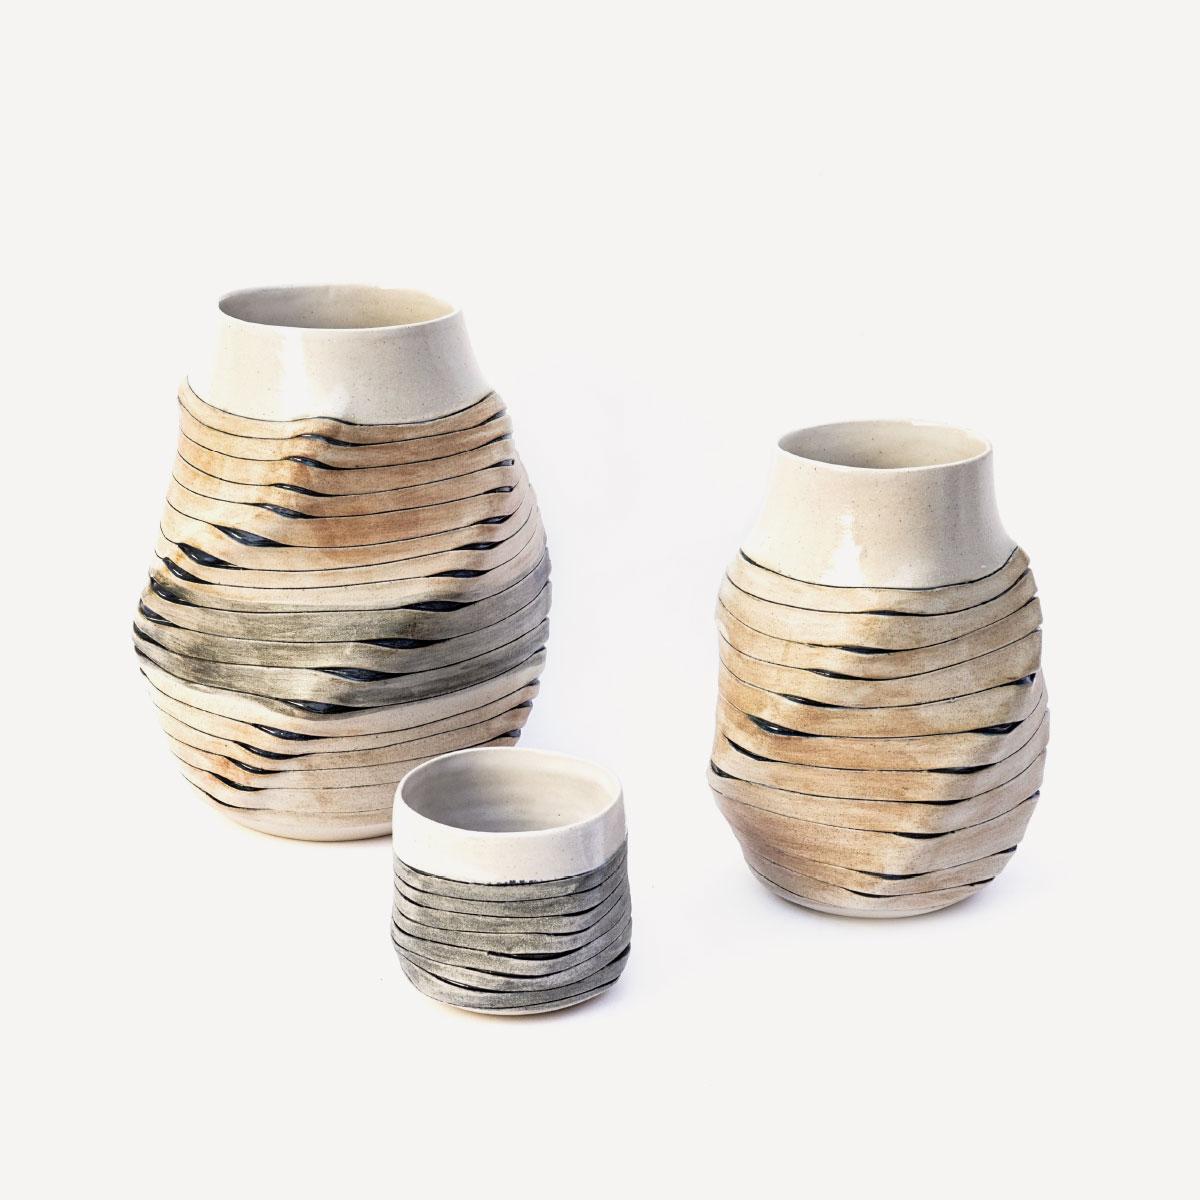 Sara Federici Ribbon Vases White Stoneware 1260 C Wheelthrown altered italiano plurale artist